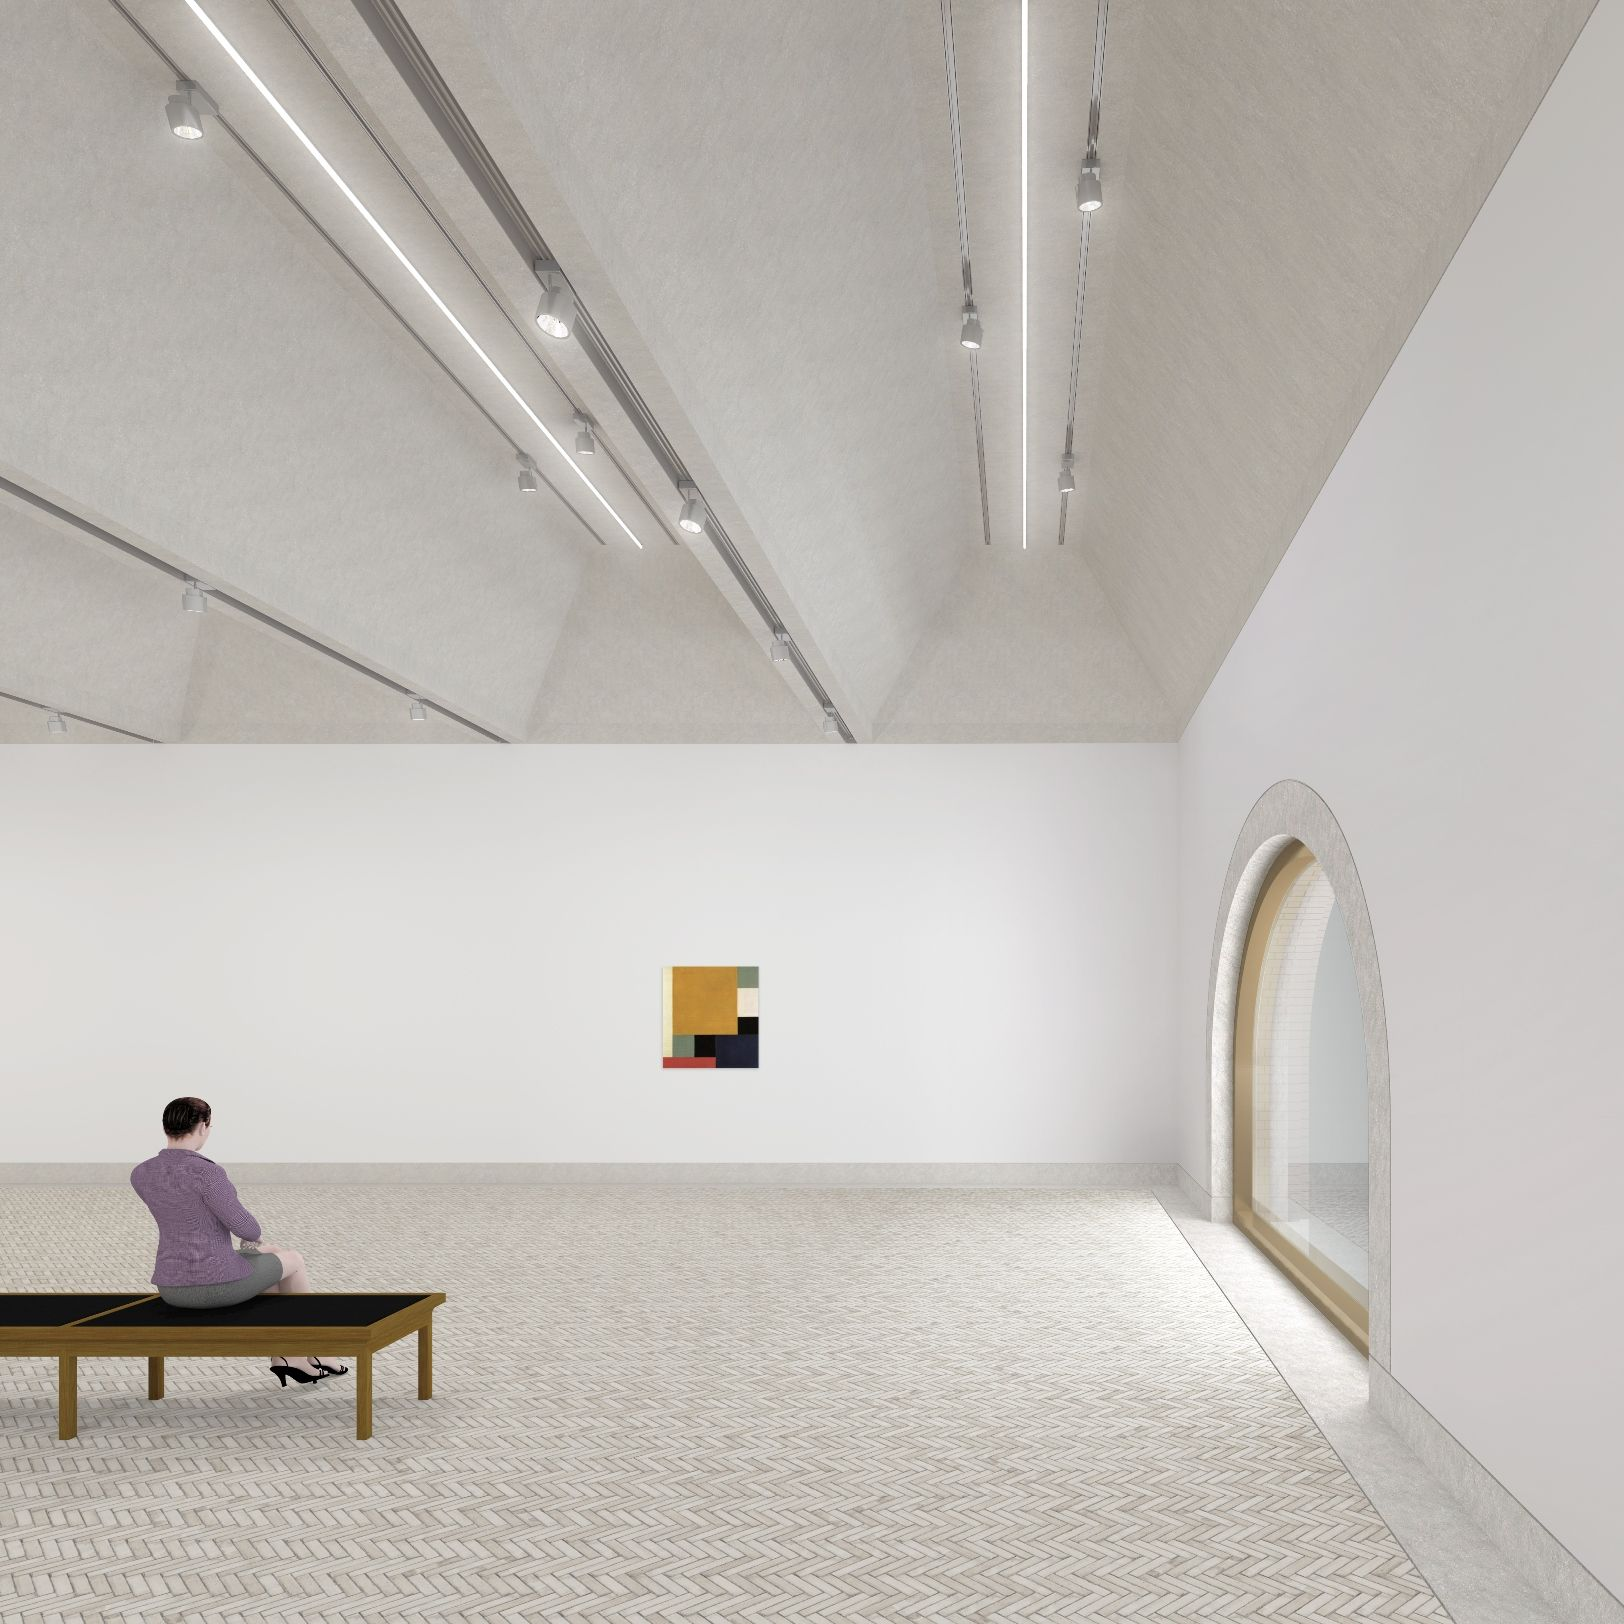 Impressie interieur Museum De Lakenhal (tentoonstellingszaal ...